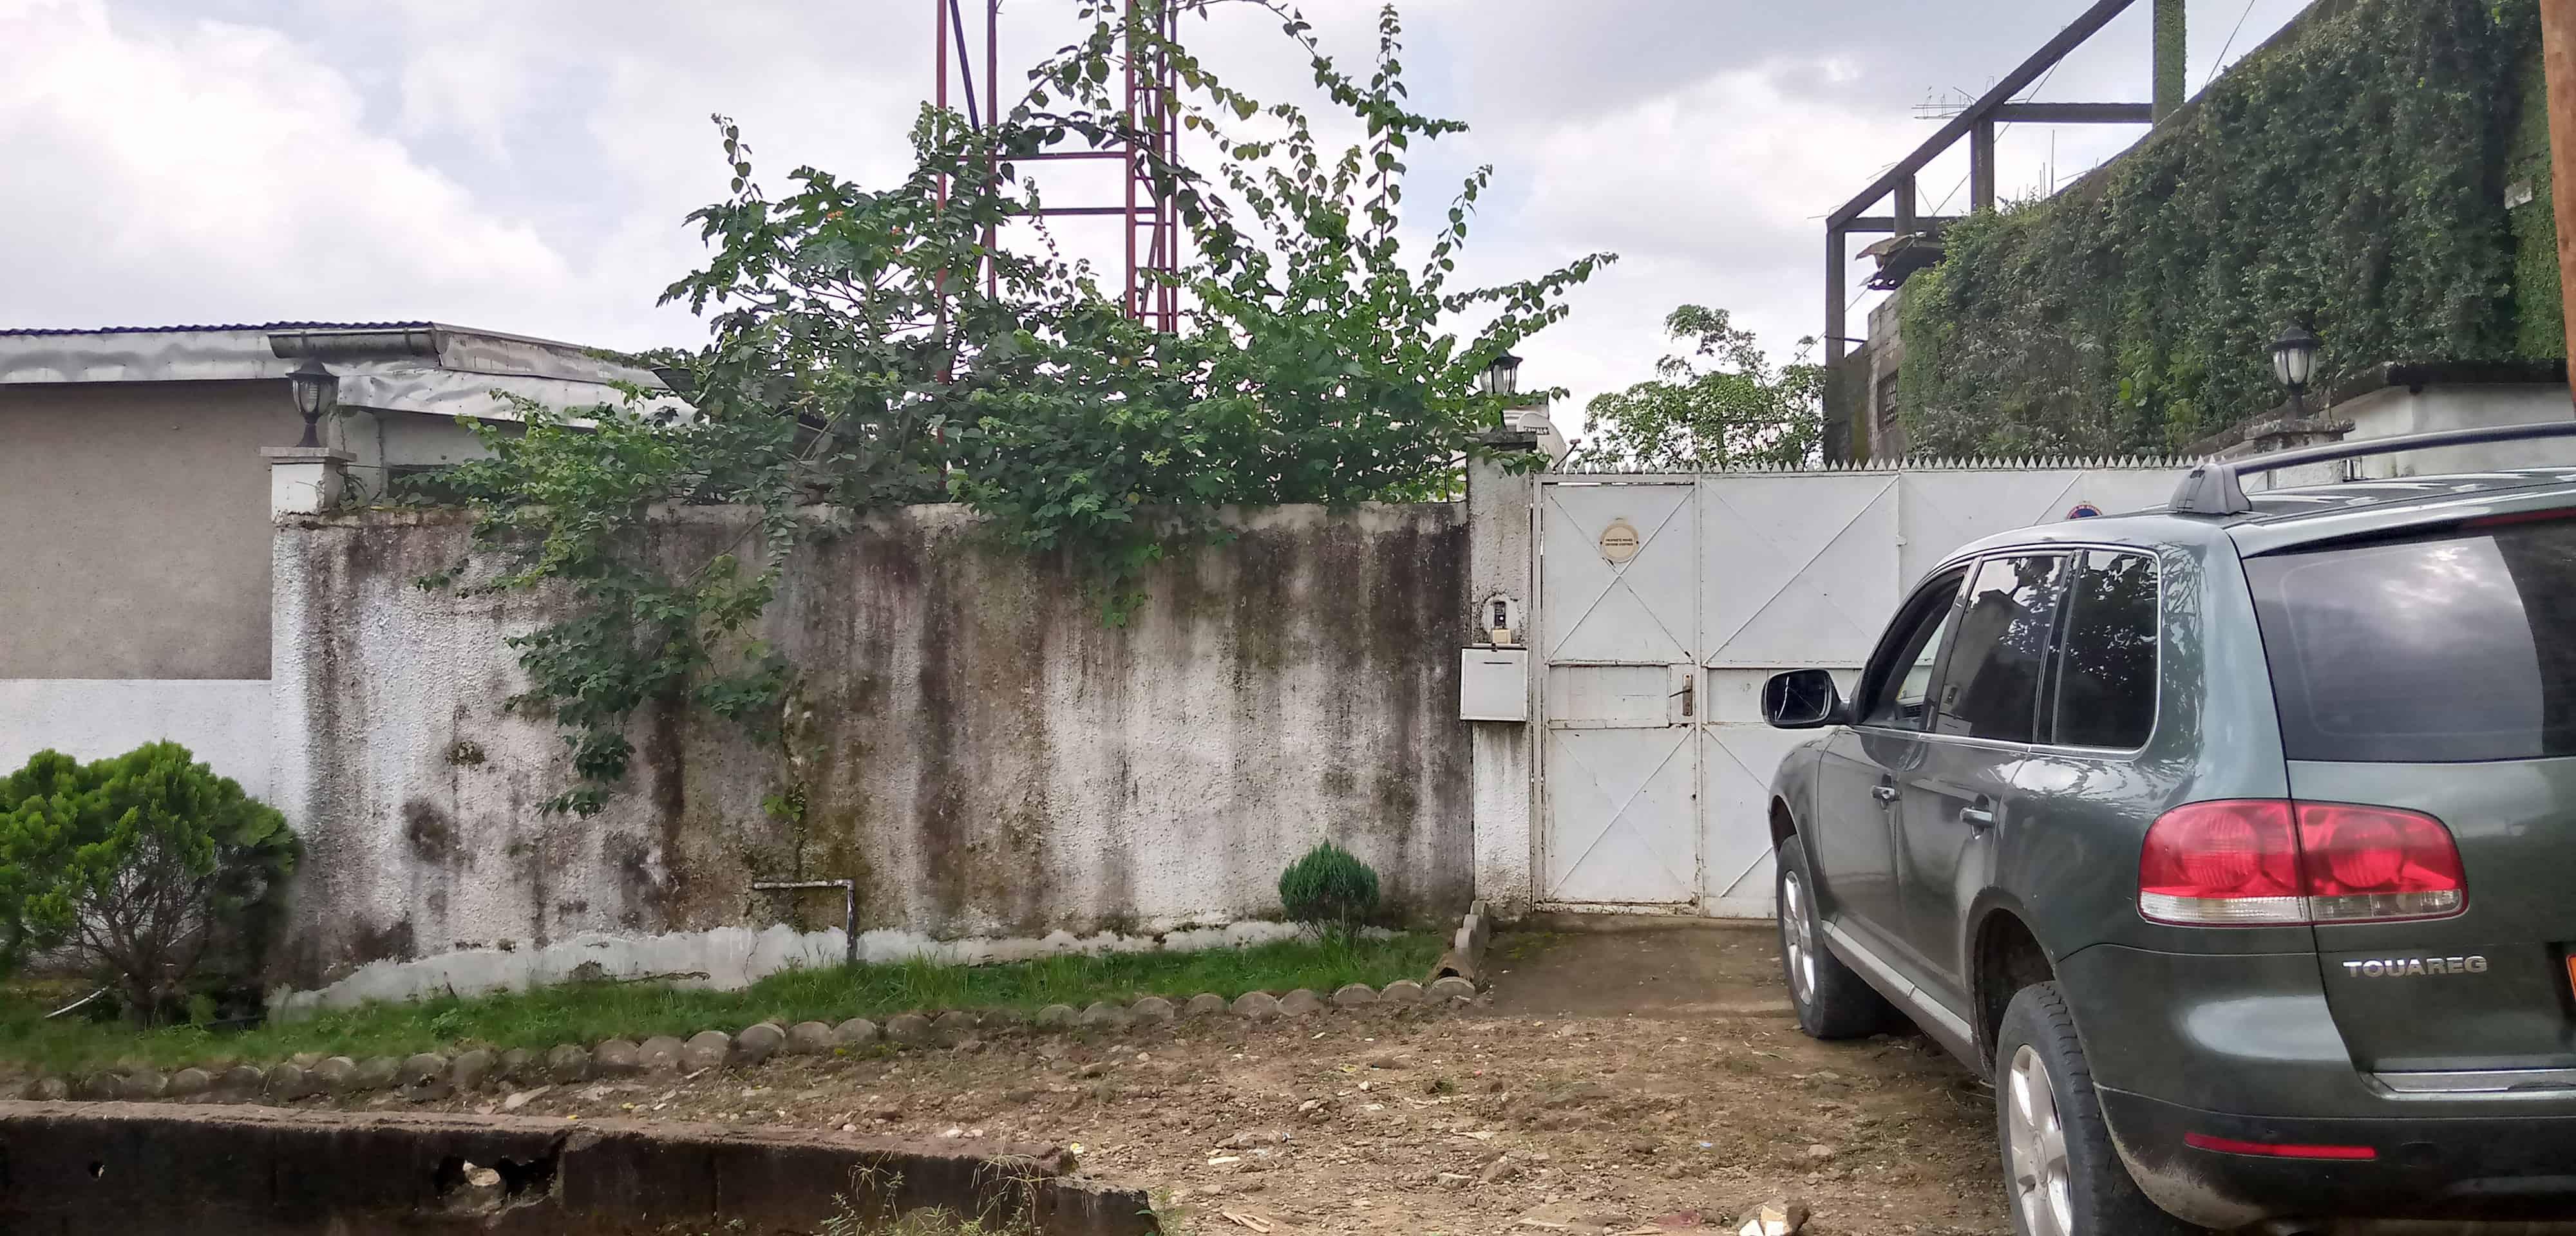 House (Villa) to rent - Douala, Ndokotti, sincates - 1 living room(s), 4 bedroom(s), 3 bathroom(s) - 500 000 FCFA / month